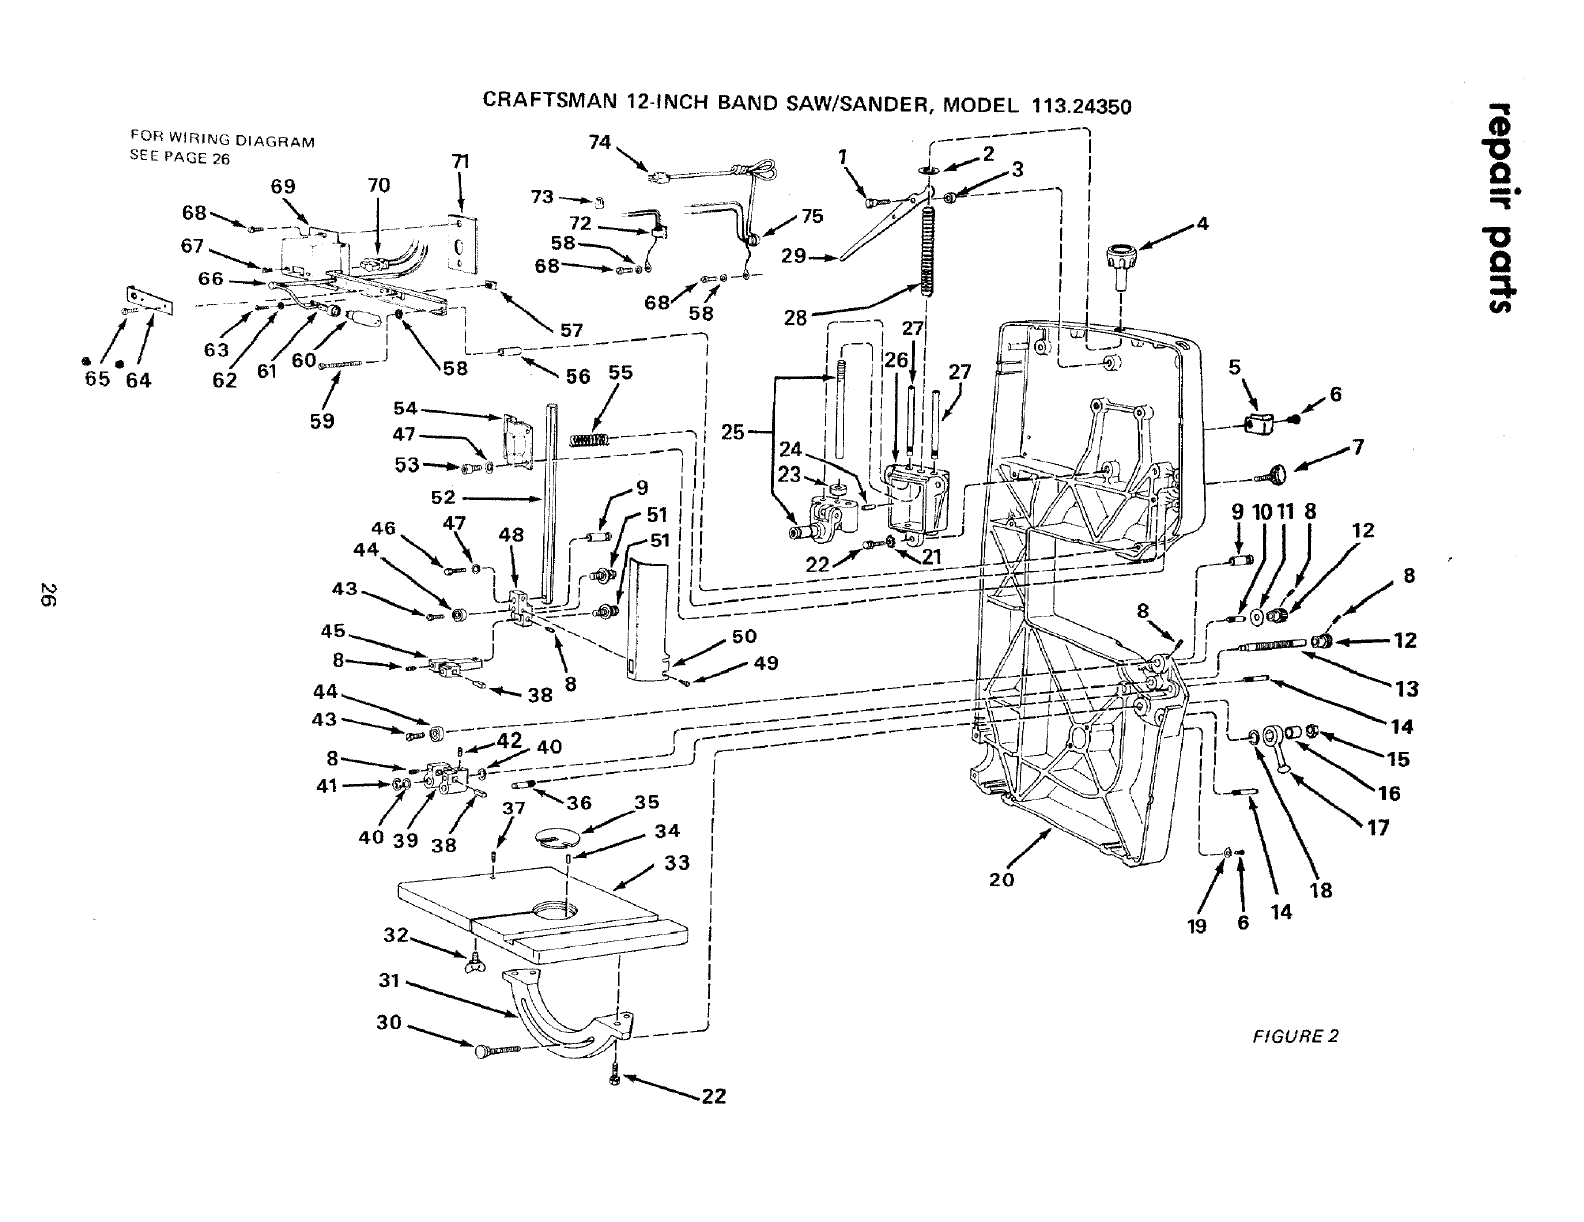 Craftsman 11324350 User Manual 12 INCH BAND SAW Manuals